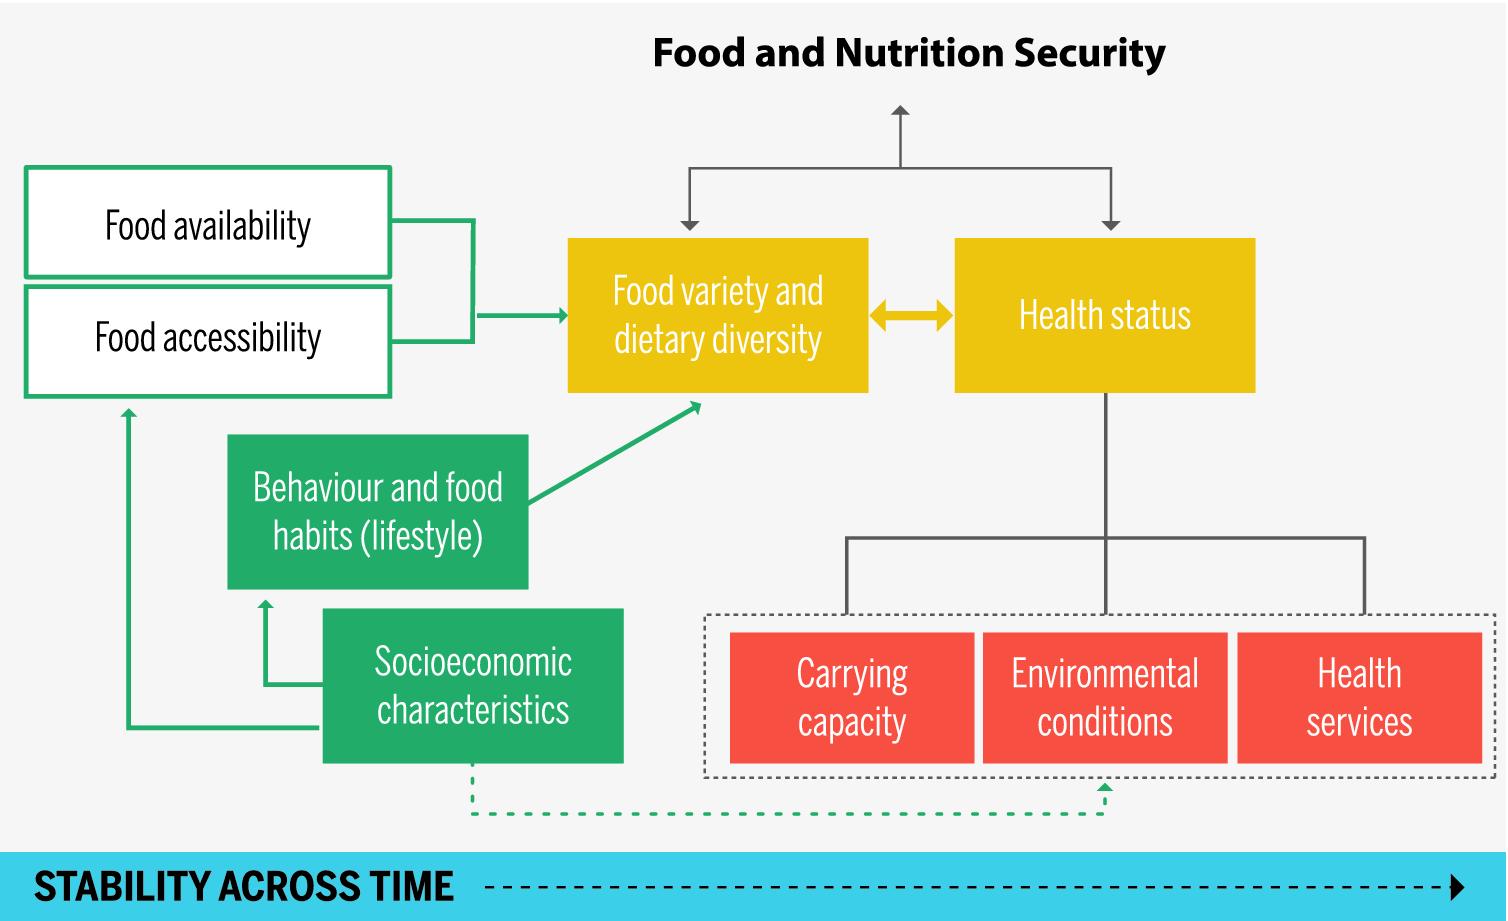 Food and Nutrition Security in the Hindu Kush Himalaya